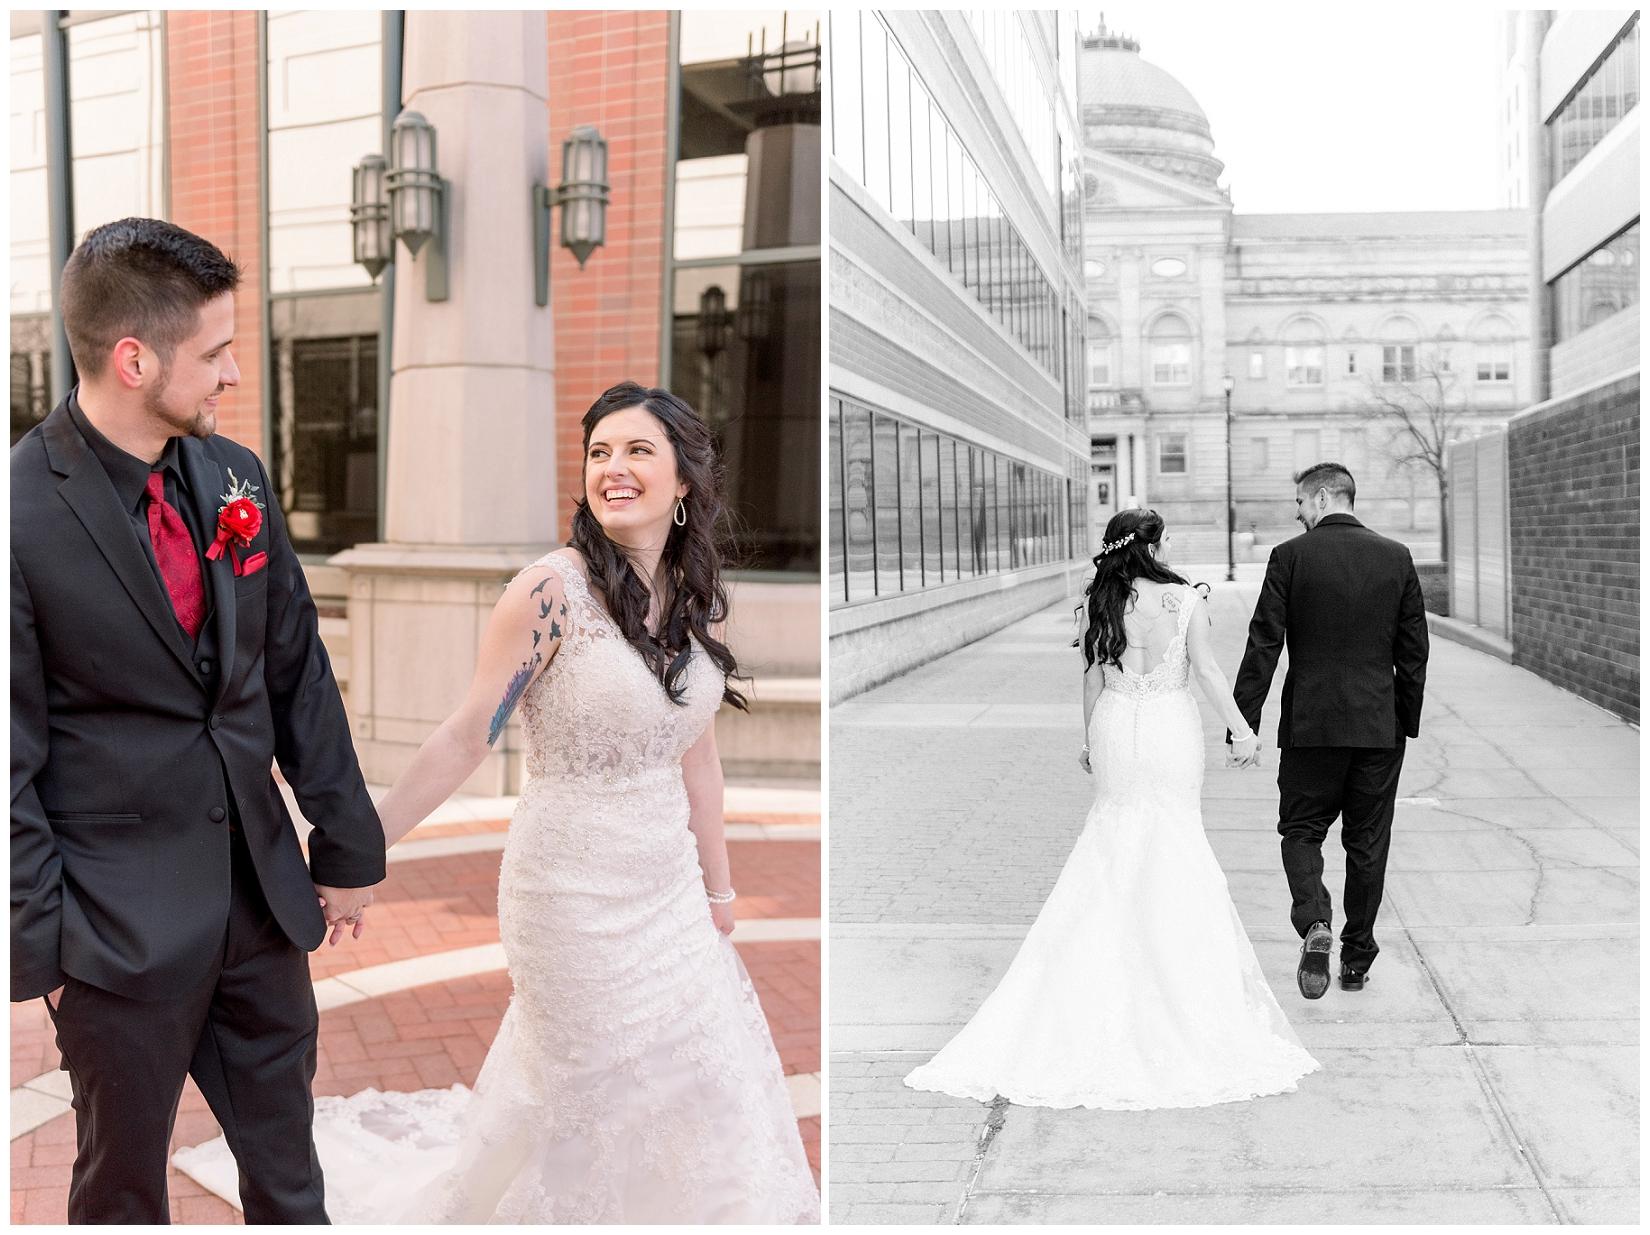 cat-alkire-wedding-photographer-indiana-chicago-indianapolis-fort-wayne_1111.jpg